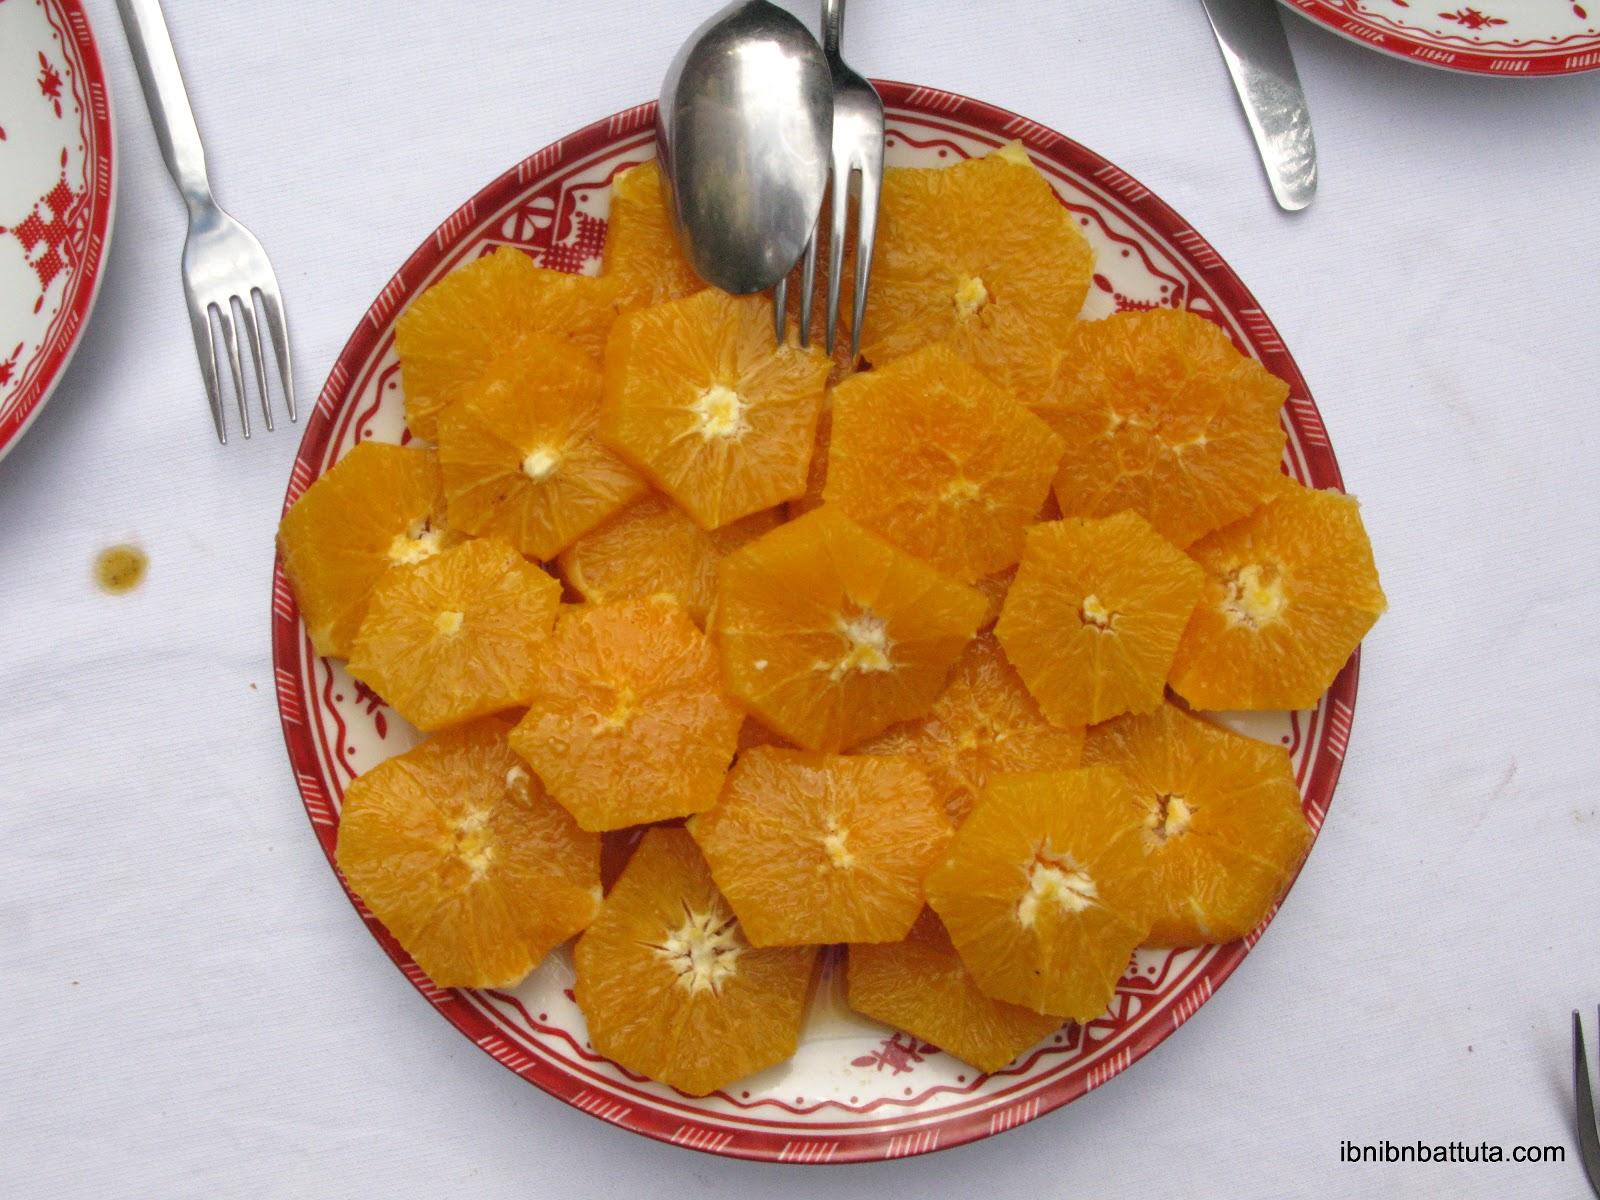 Basic Moroccan dessert: oranges and cinnamon